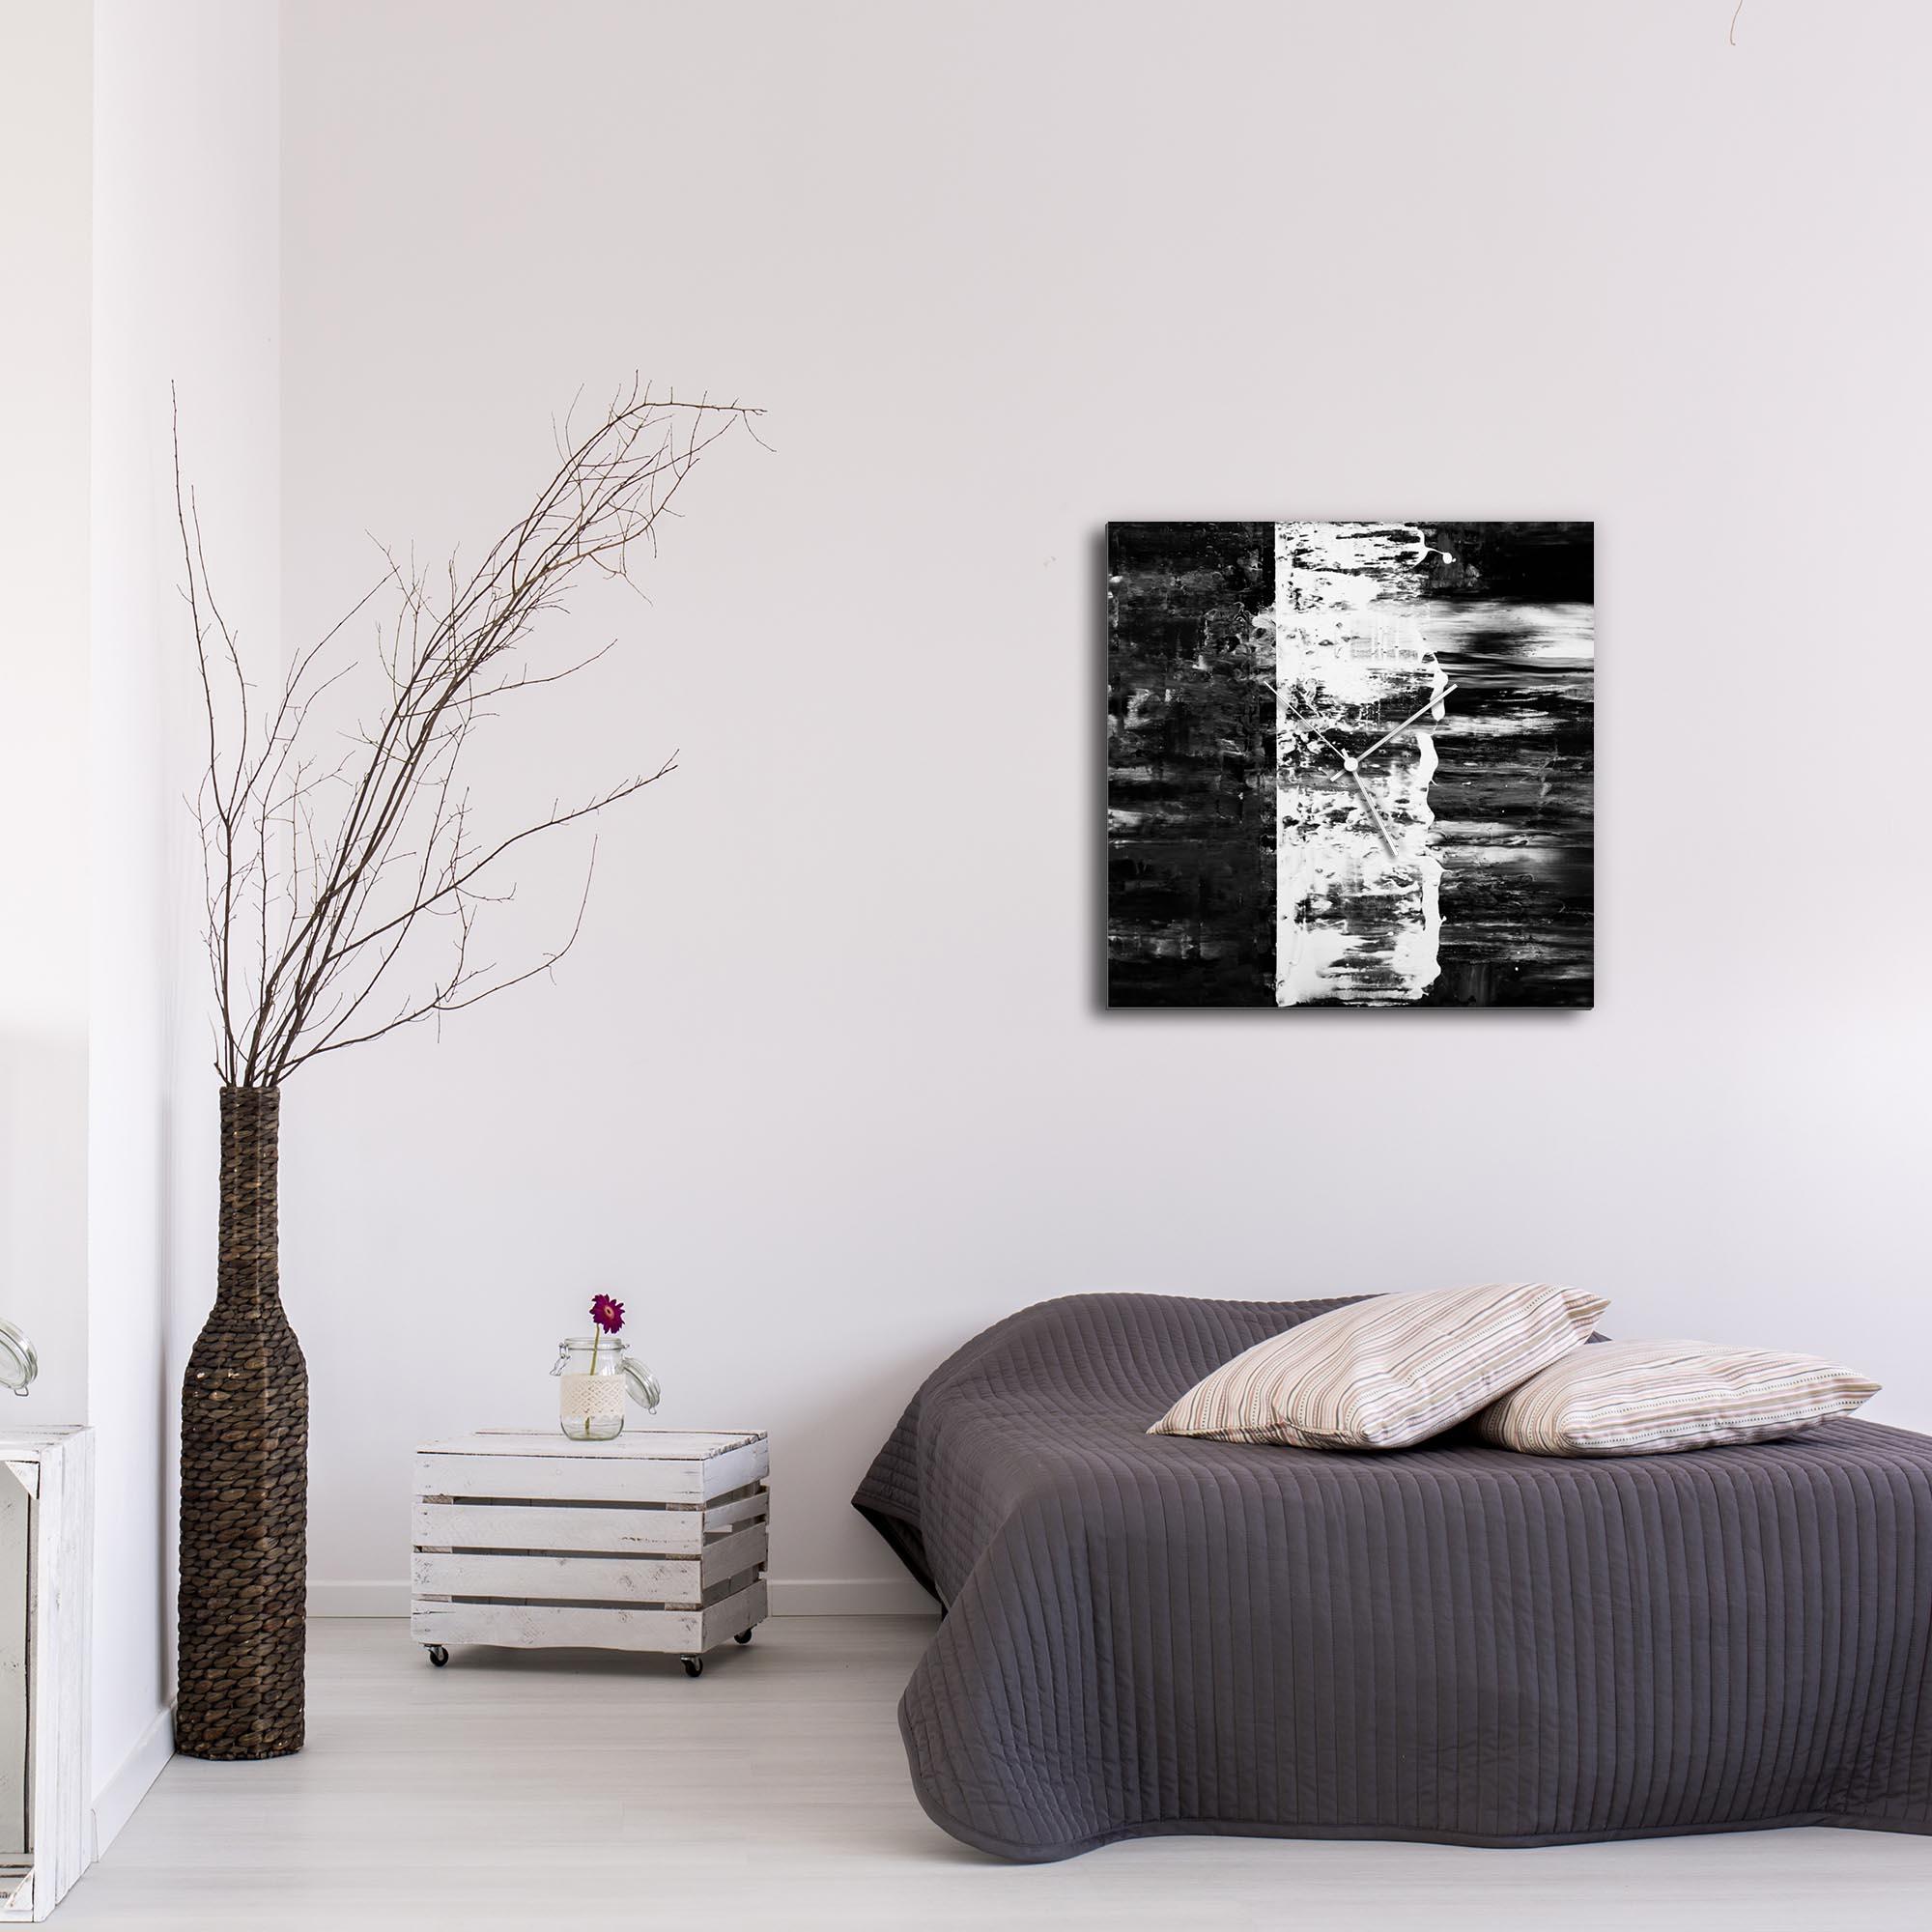 Black Street Square Clock Large by Mendo Vasilevski - Urban Abstract Home Decor - Lifestyle View